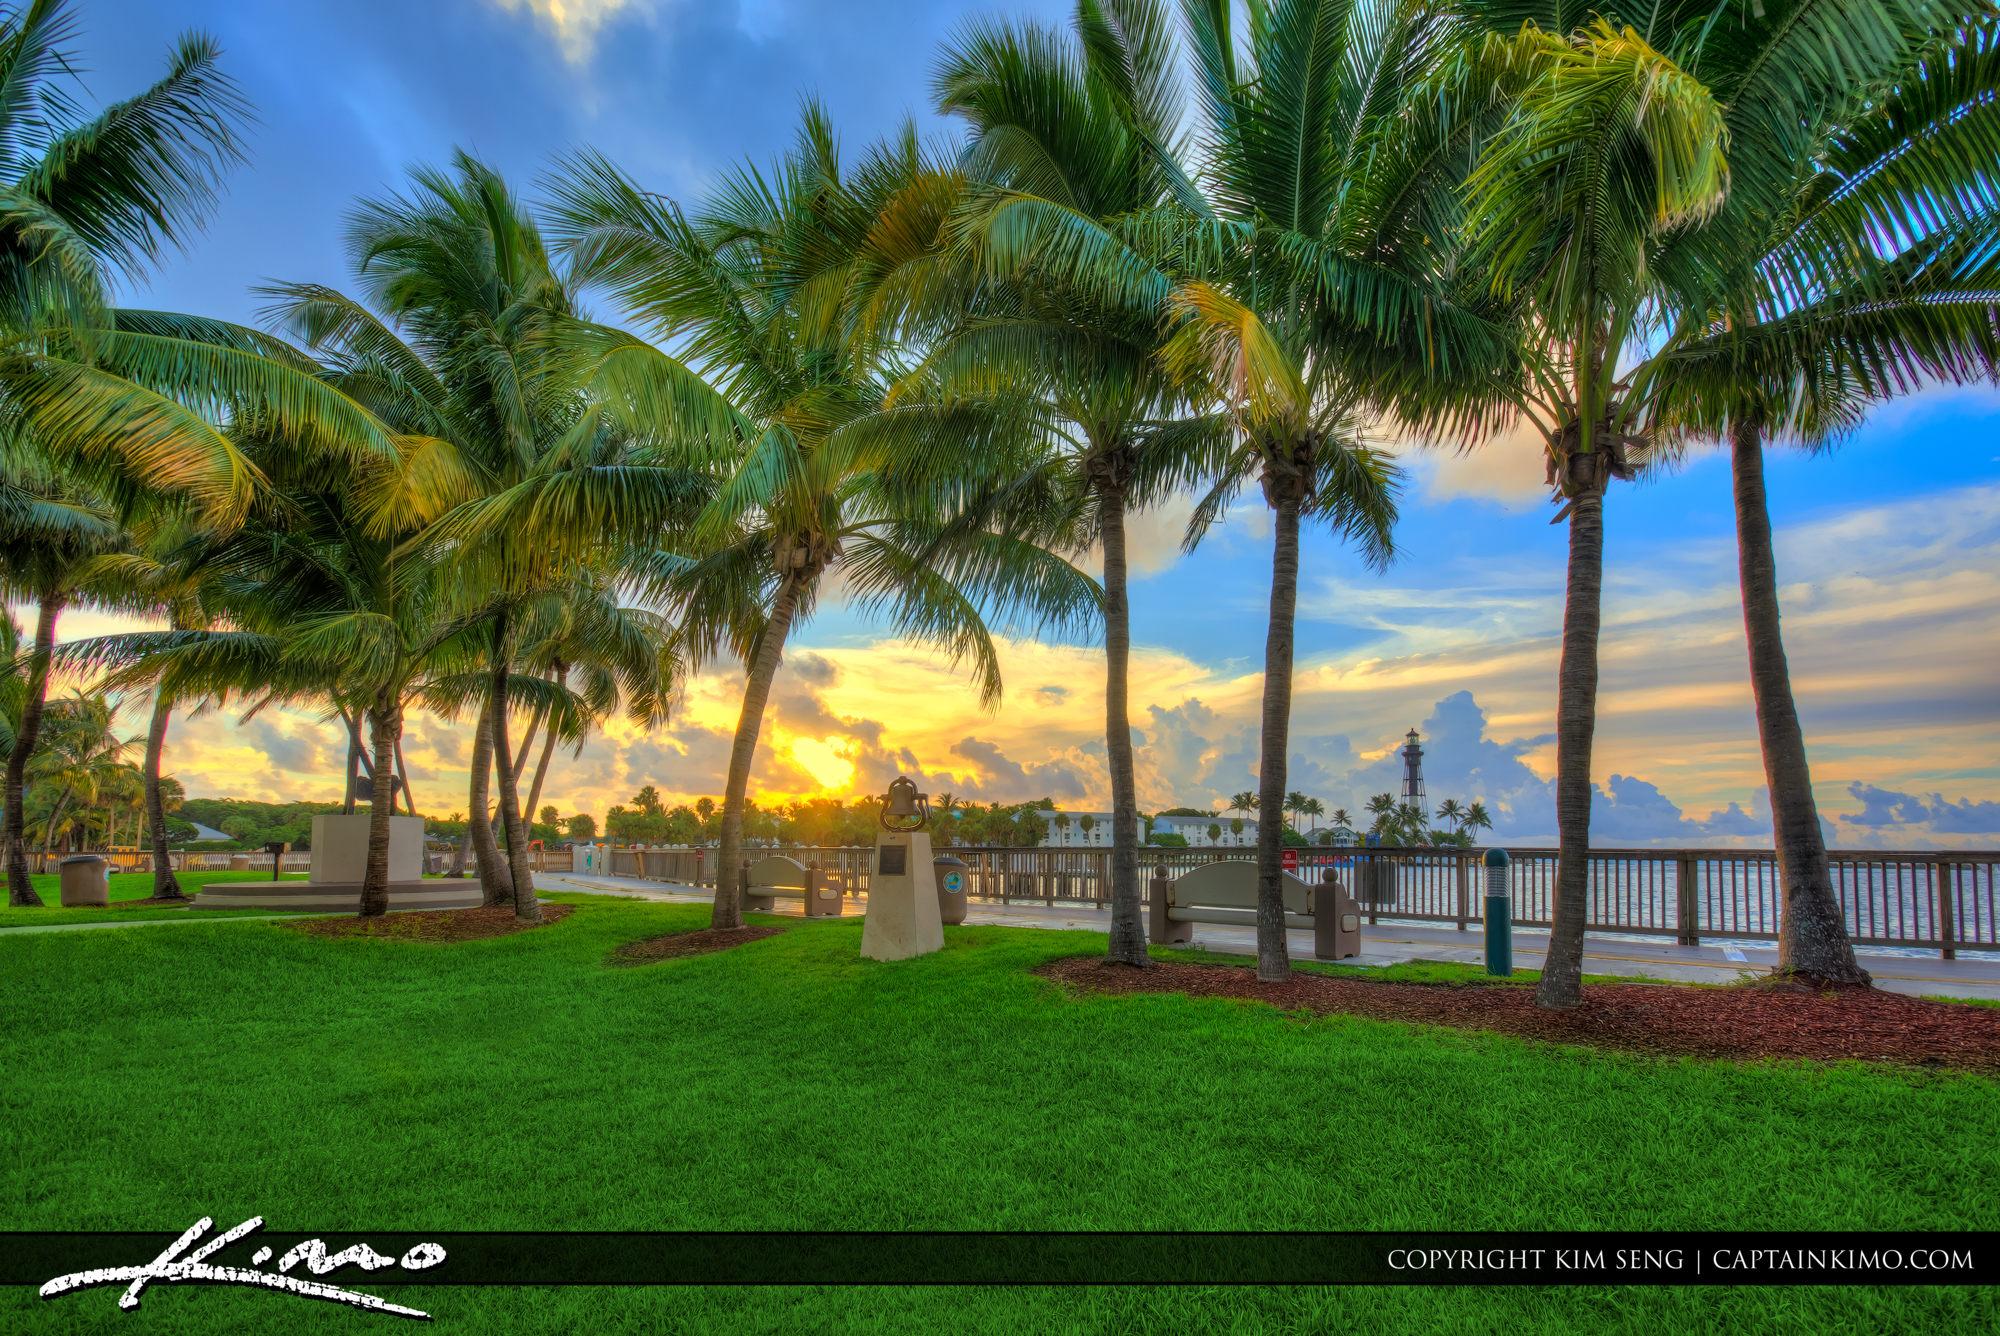 Hillsboro Inlet Park Pompano Beach Florida